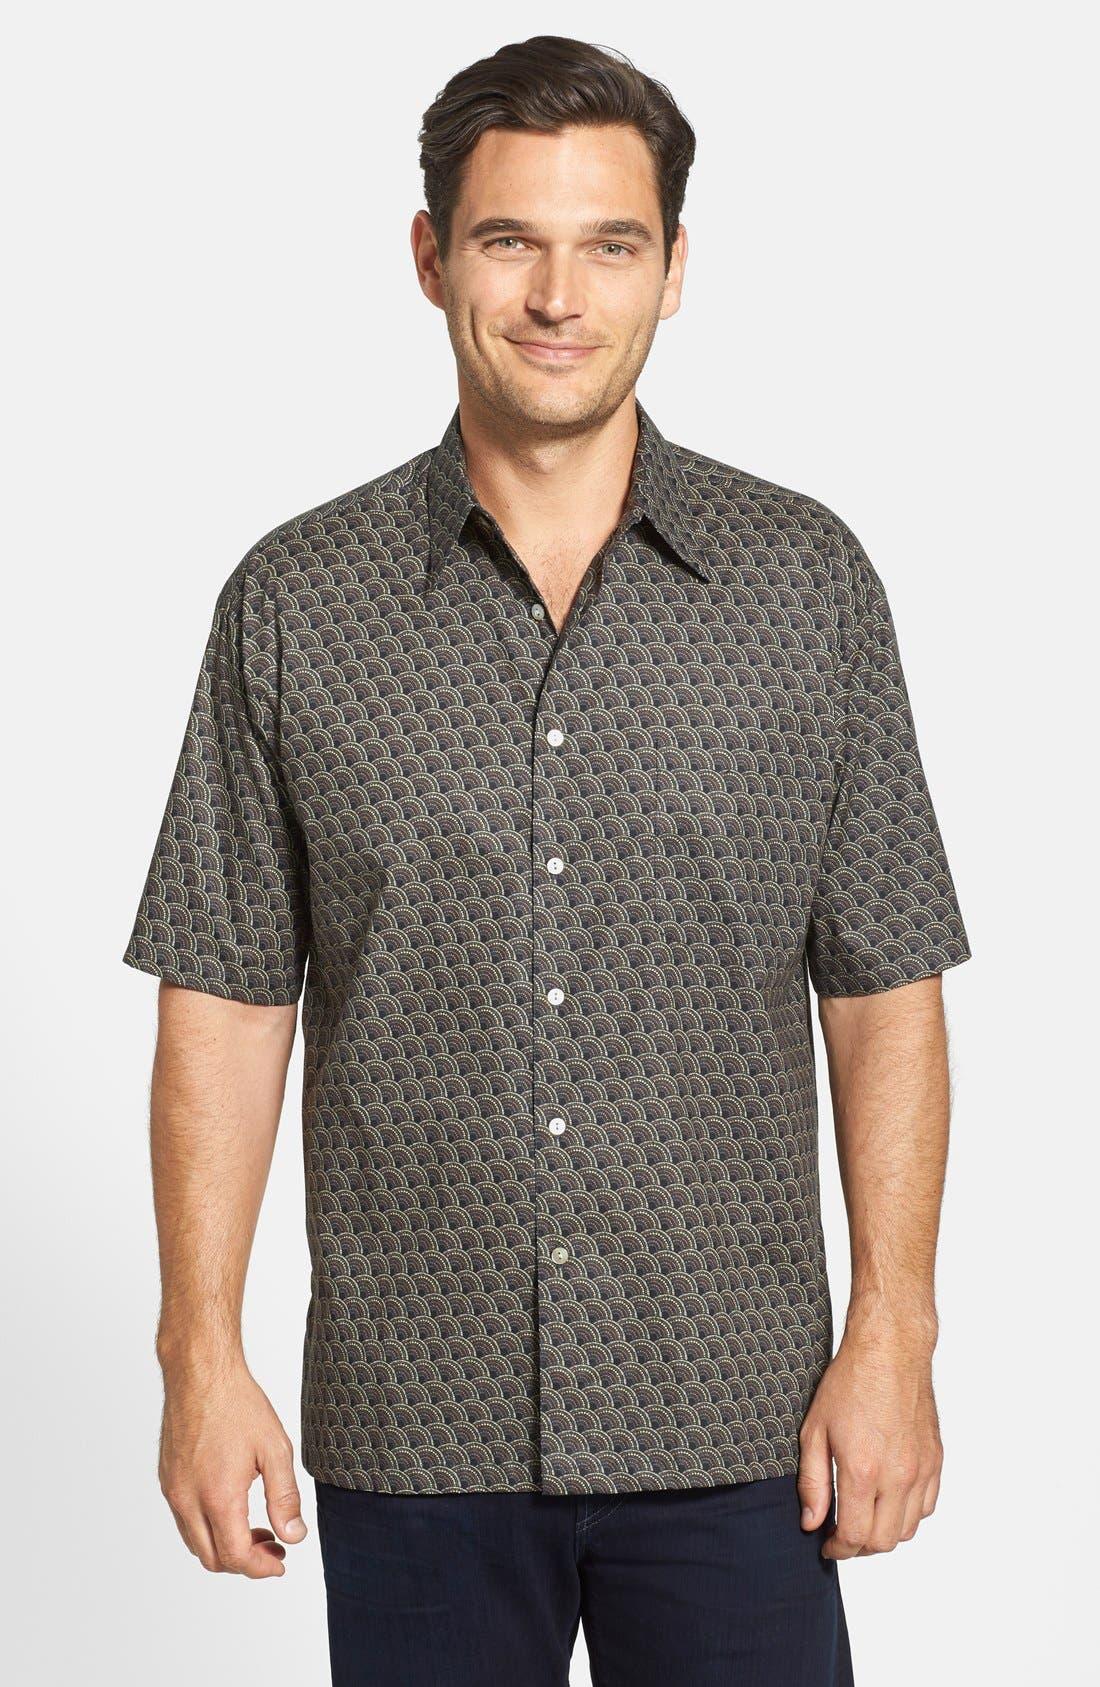 Alternate Image 1 Selected - Tori Richard 'Deco' Classic Fit Short Sleeve Cotton Lawn Sport Shirt